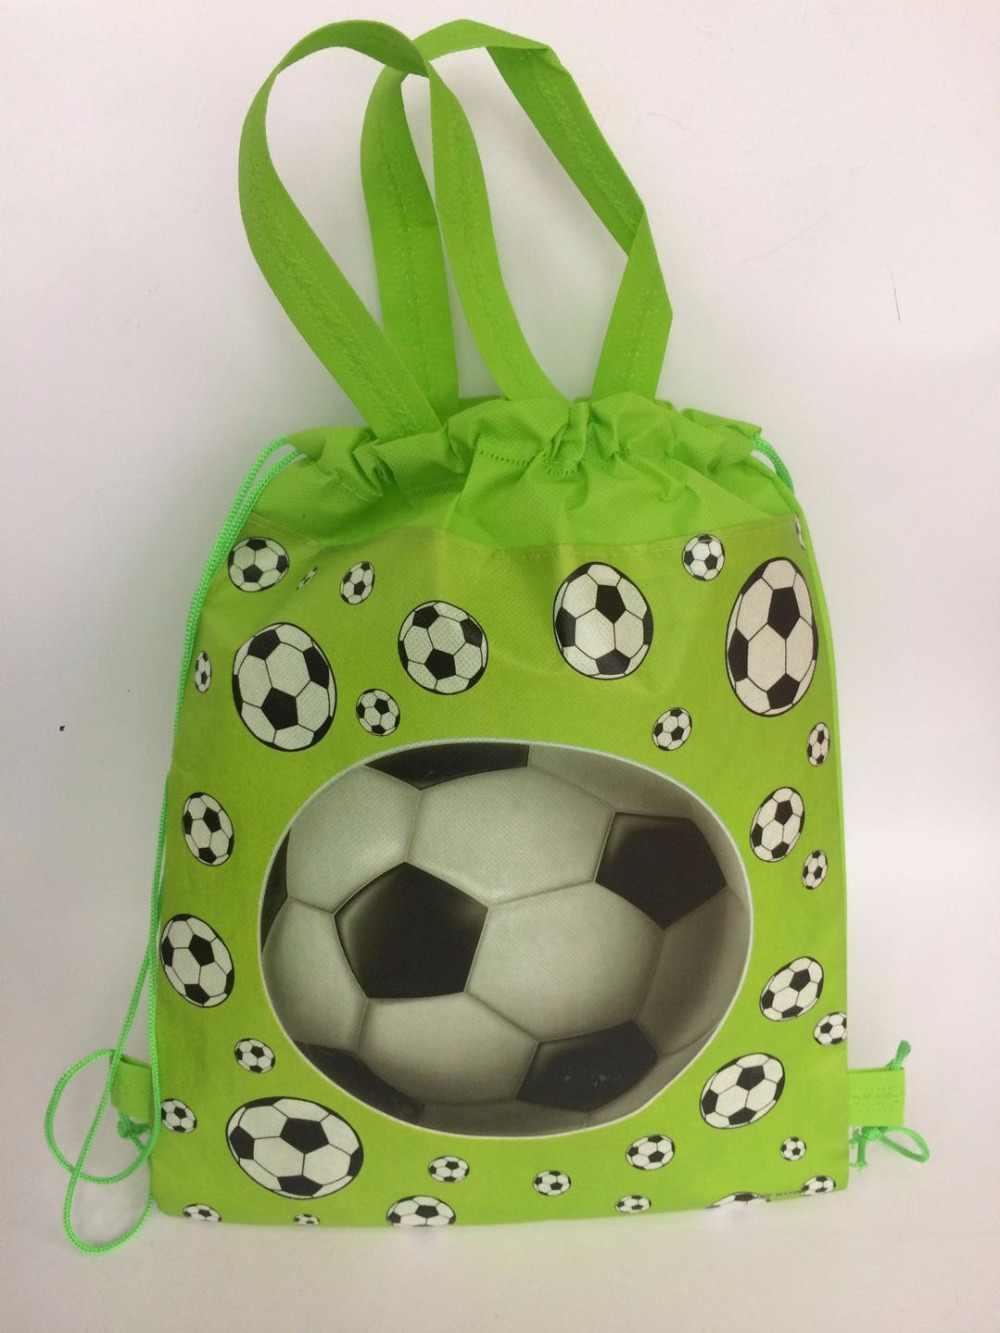 Childrens Backpack Footballl School Bag For Runner Waterproof Shoe Kids Gift Birthday